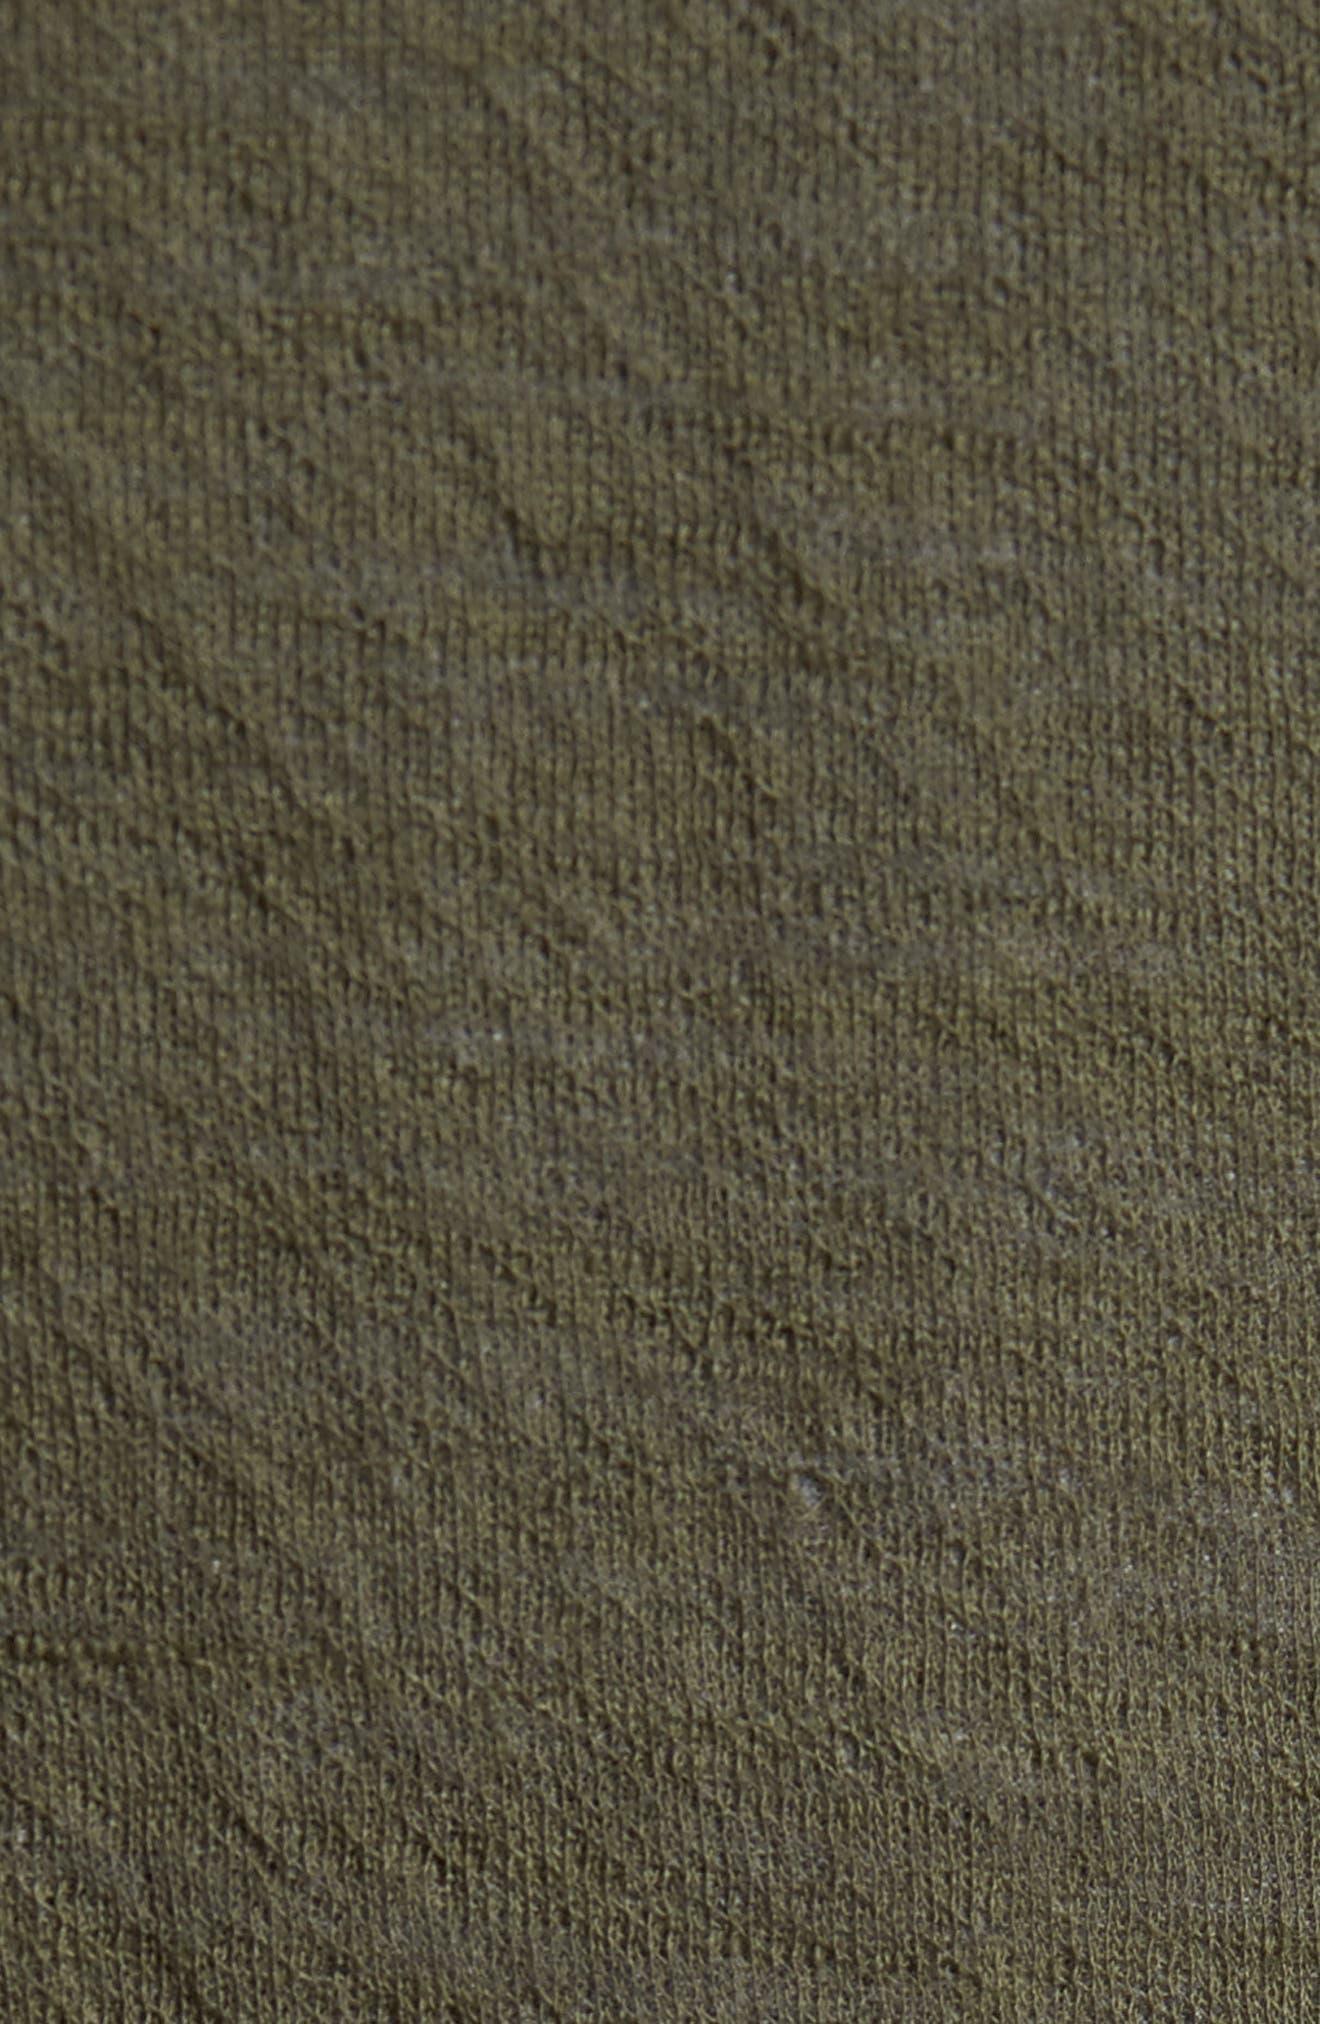 Double Knit Long Sleeve Shirt,                             Alternate thumbnail 9, color,